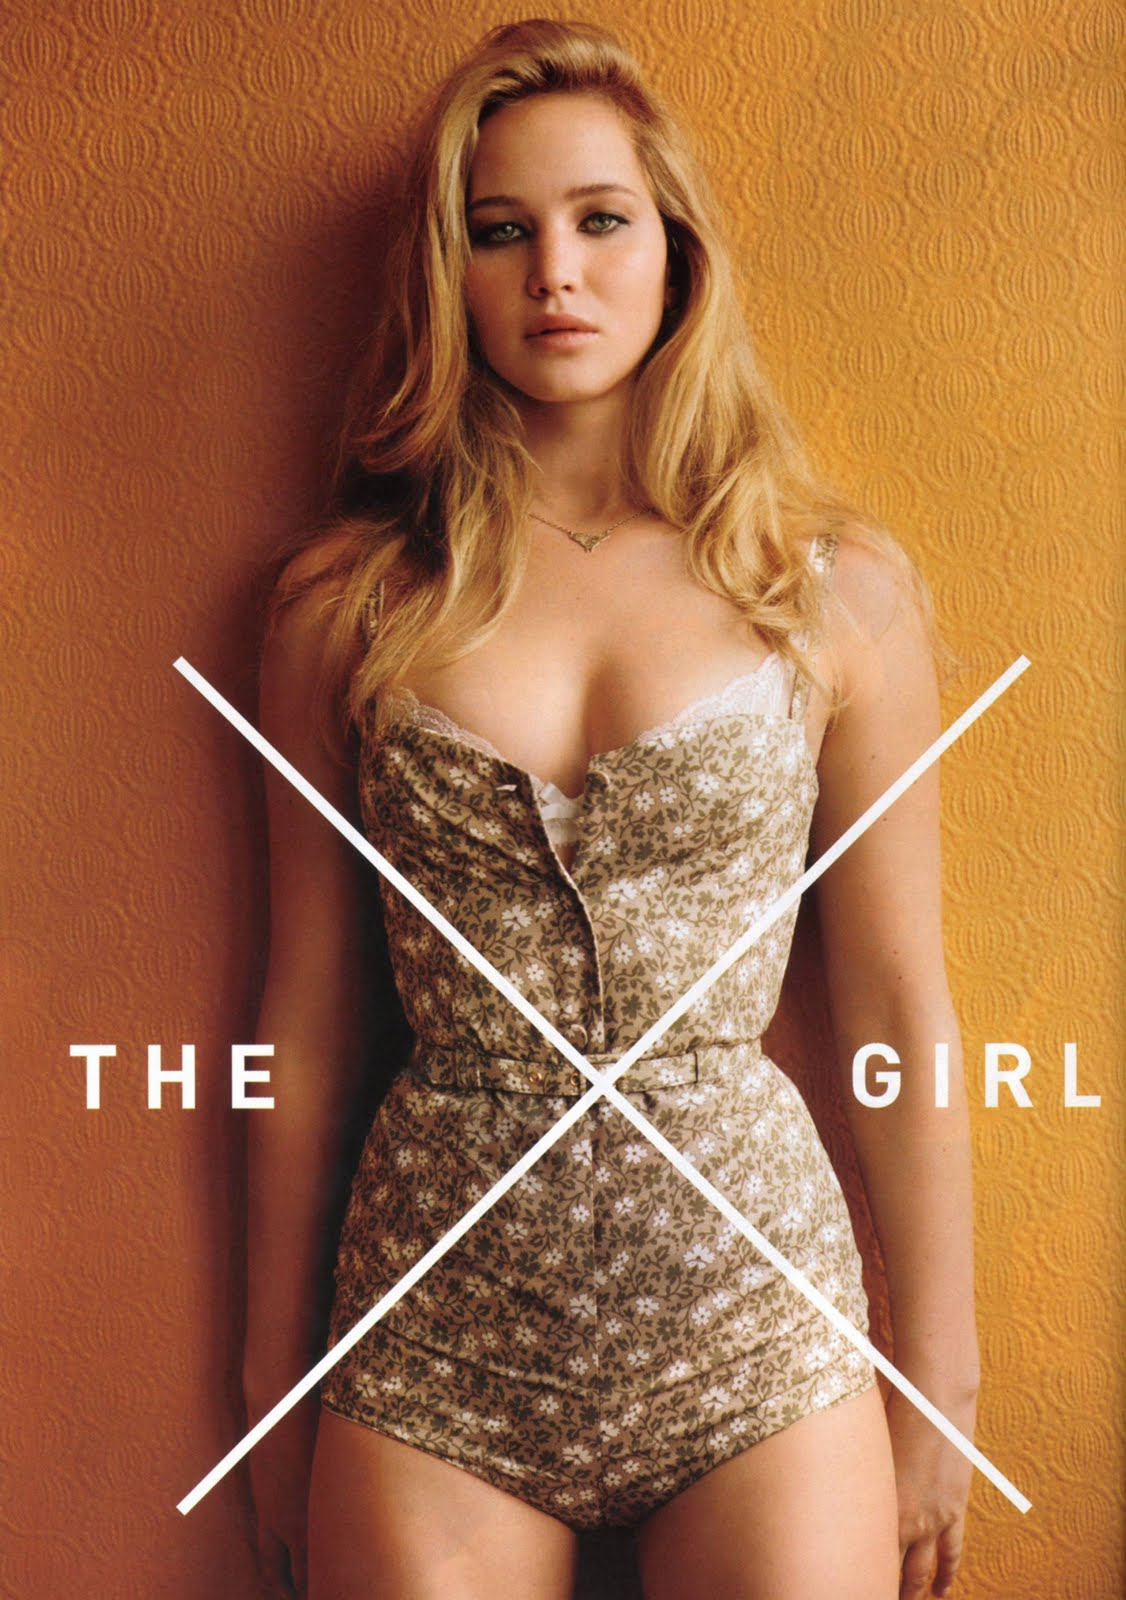 http://3.bp.blogspot.com/-GOcnlFt-31M/TeyzA88hqII/AAAAAAAAJ1s/N2yC9A_57Xo/s1600/Jennifer+Lawrence+GQ+Magazine+May+2011+%25281%2529.jpg